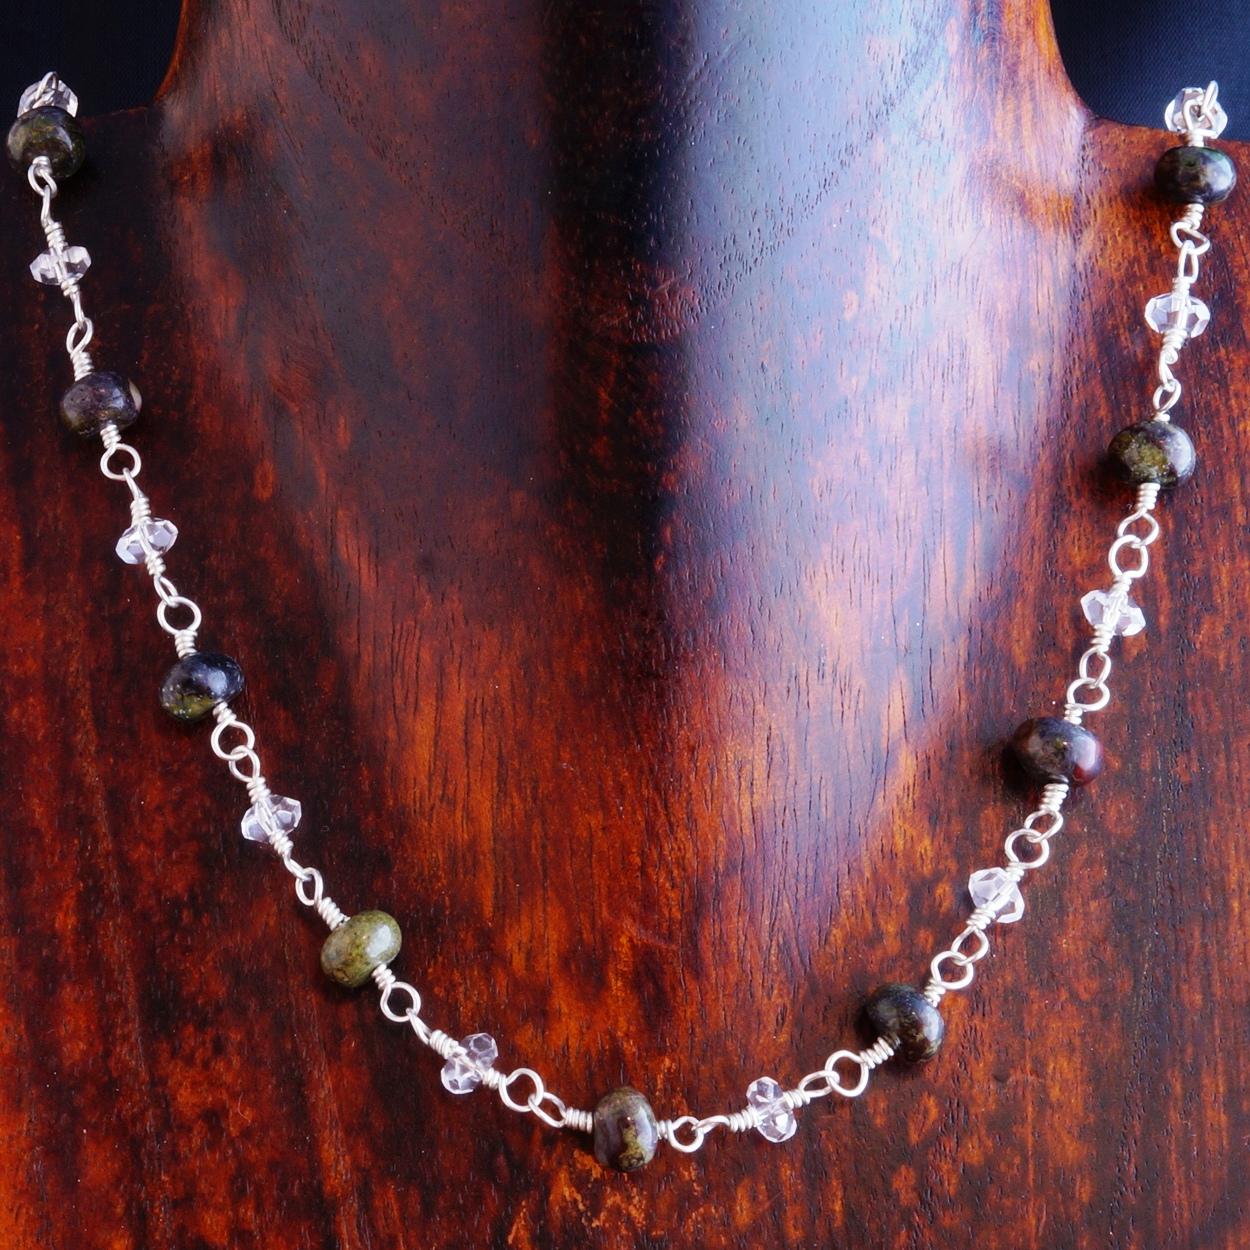 Handmade Sterling Silver Bloodstone Quartz Necklace